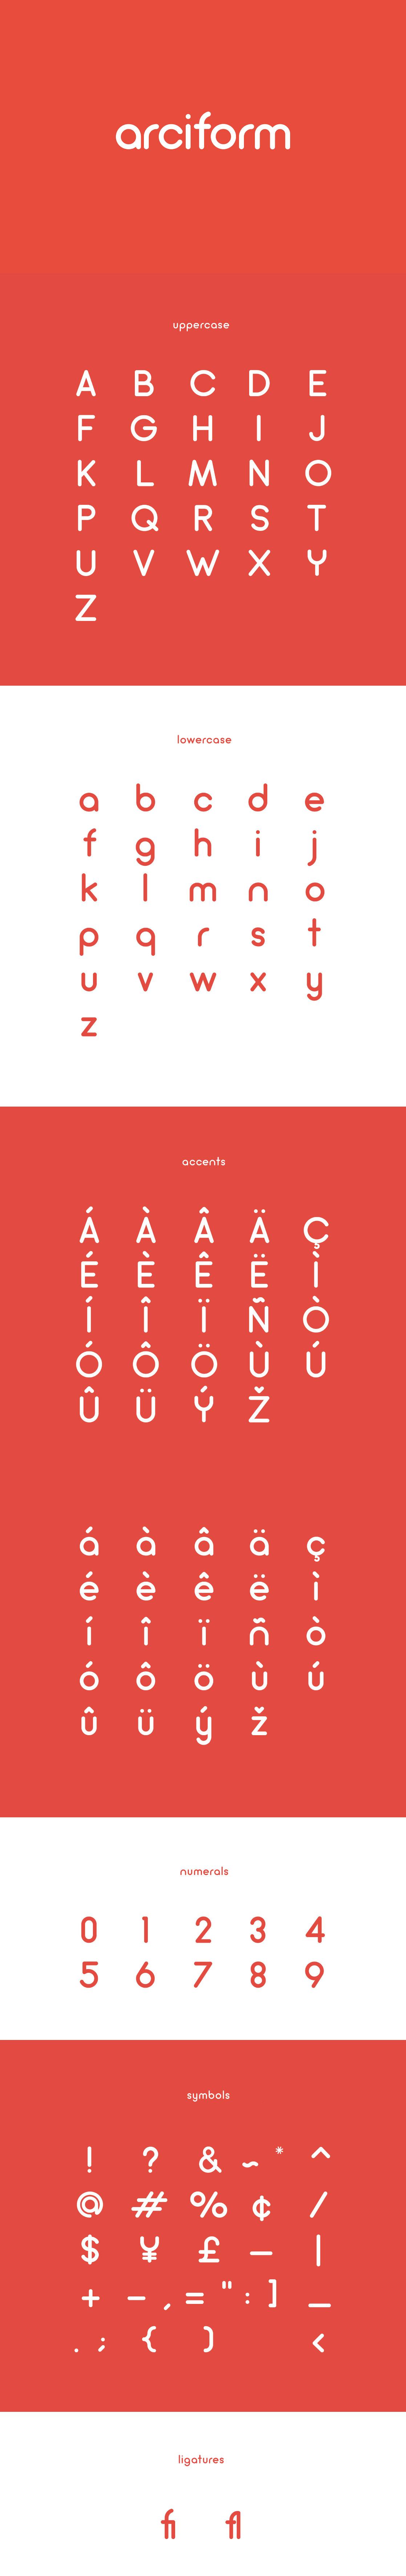 Arciform Free Typeface